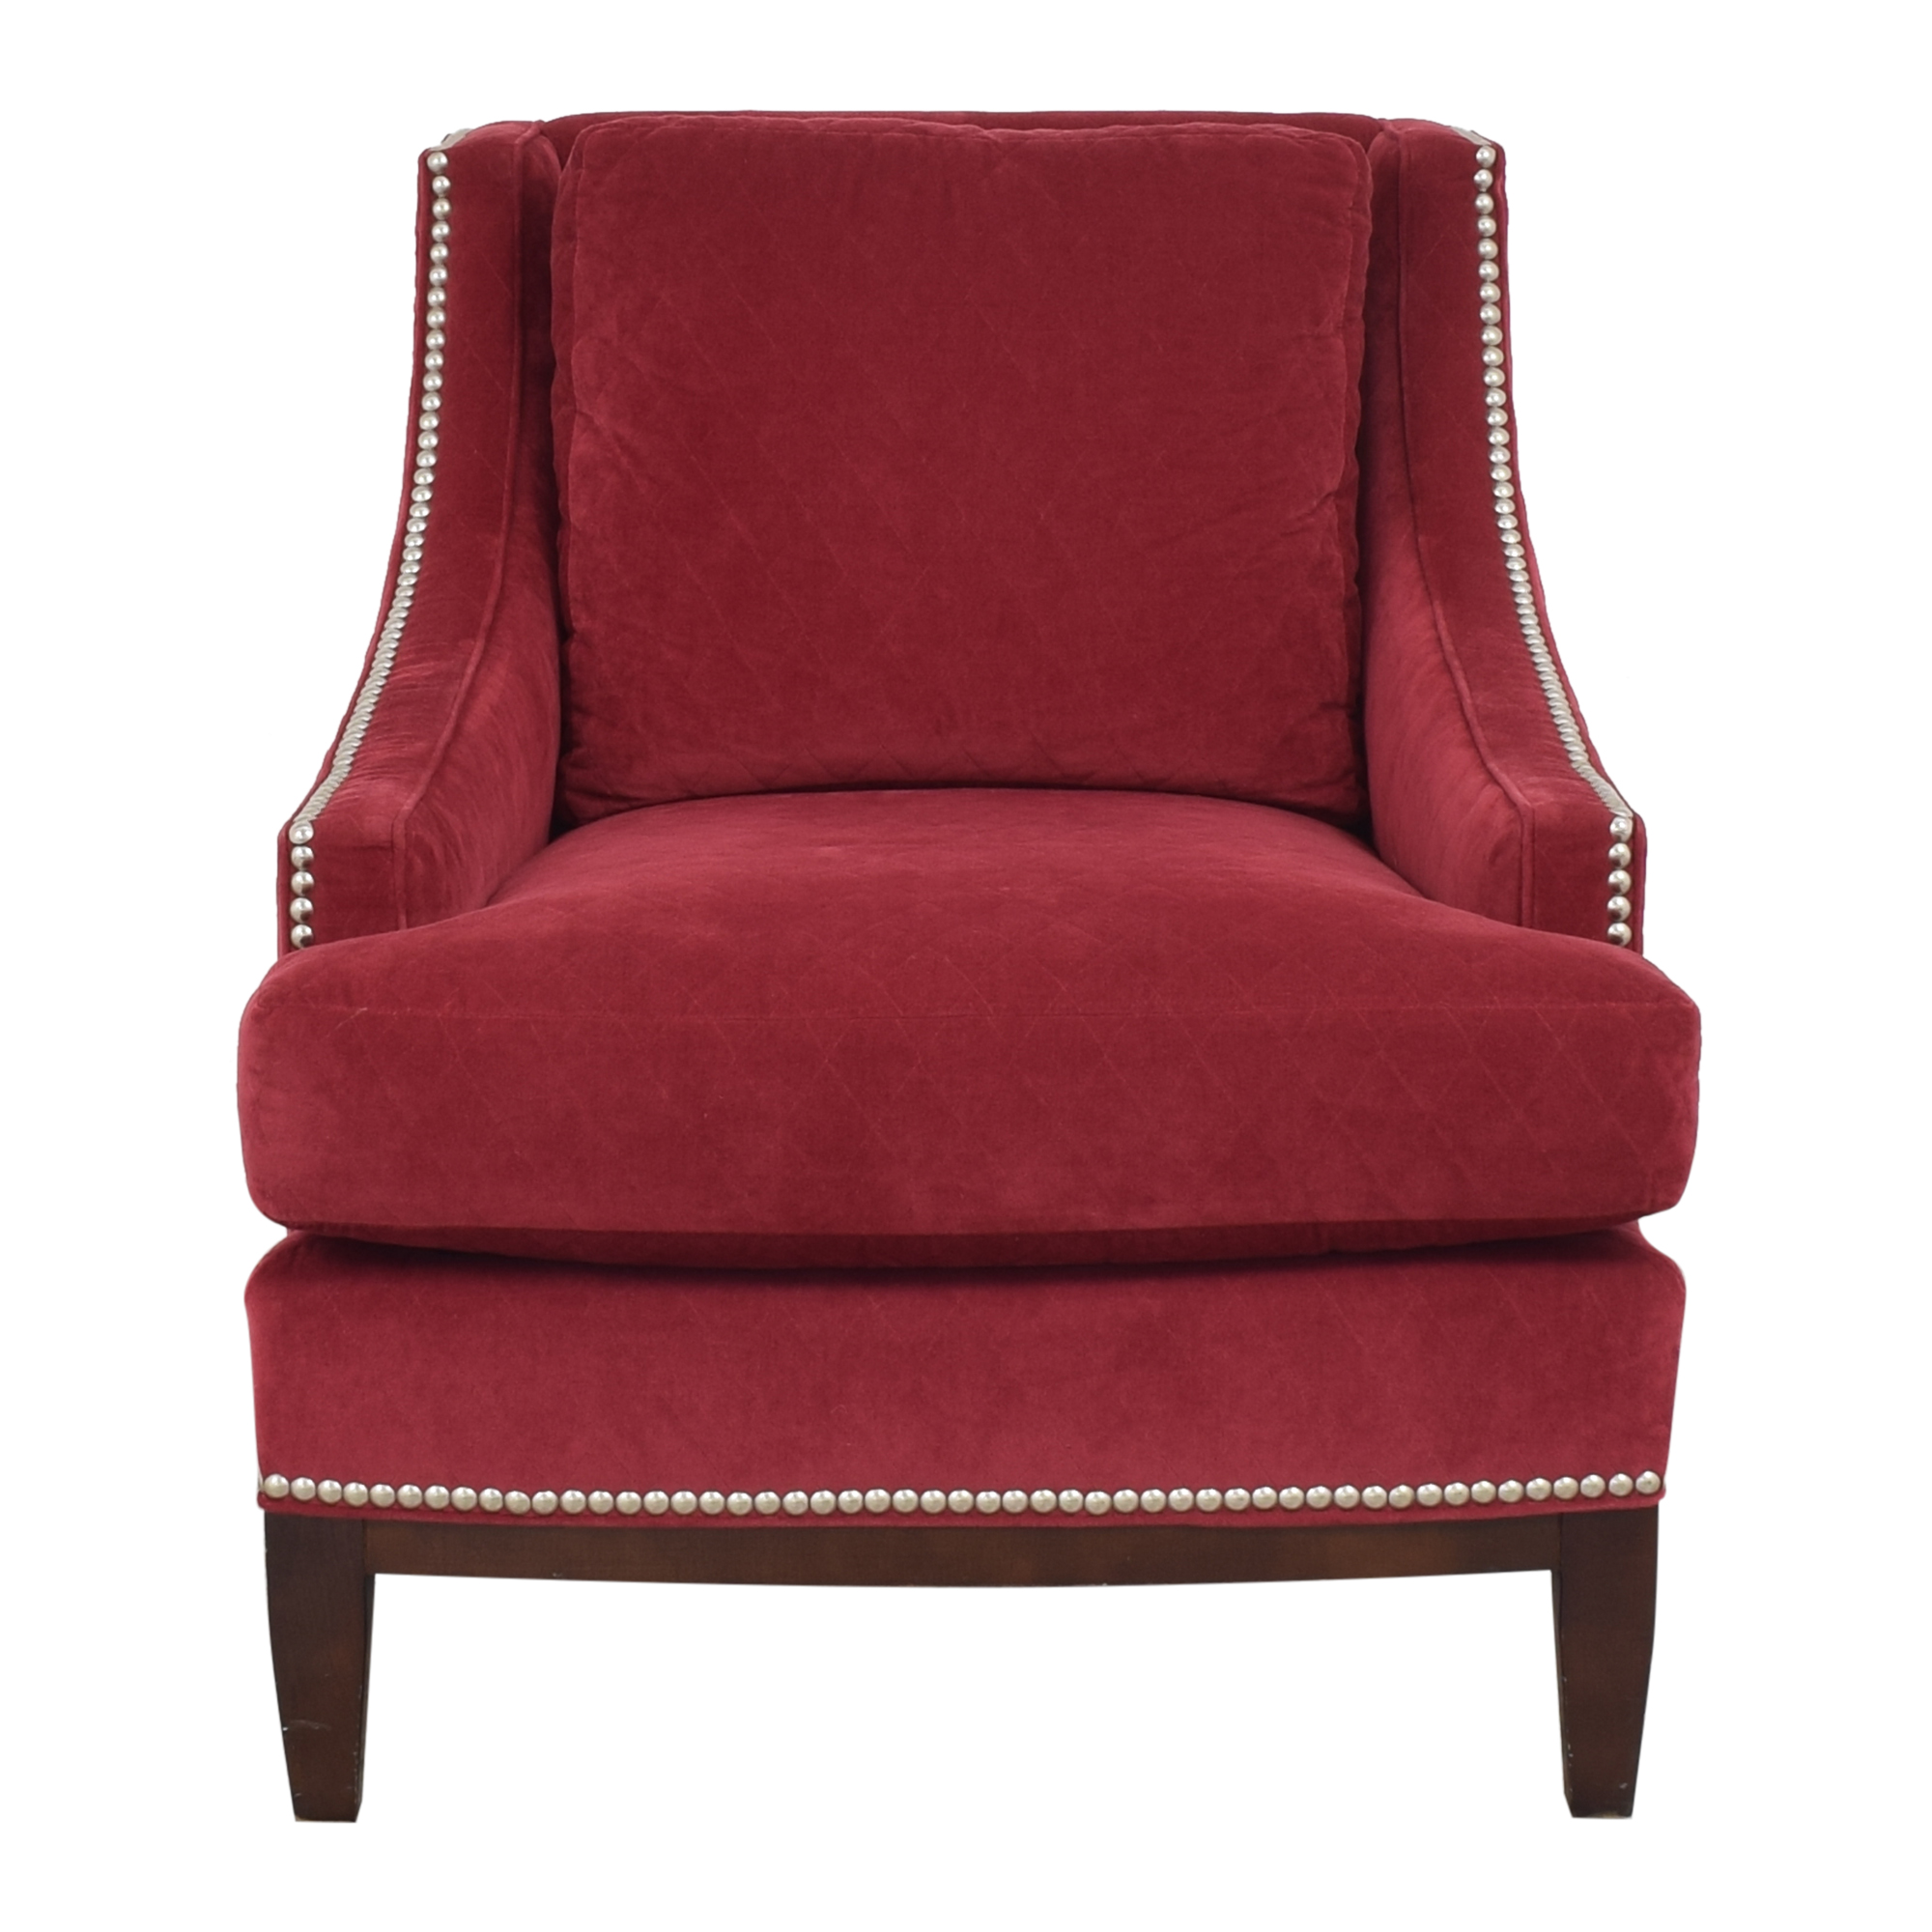 shop Kravet Bellair Accent Chair Kravet Chairs